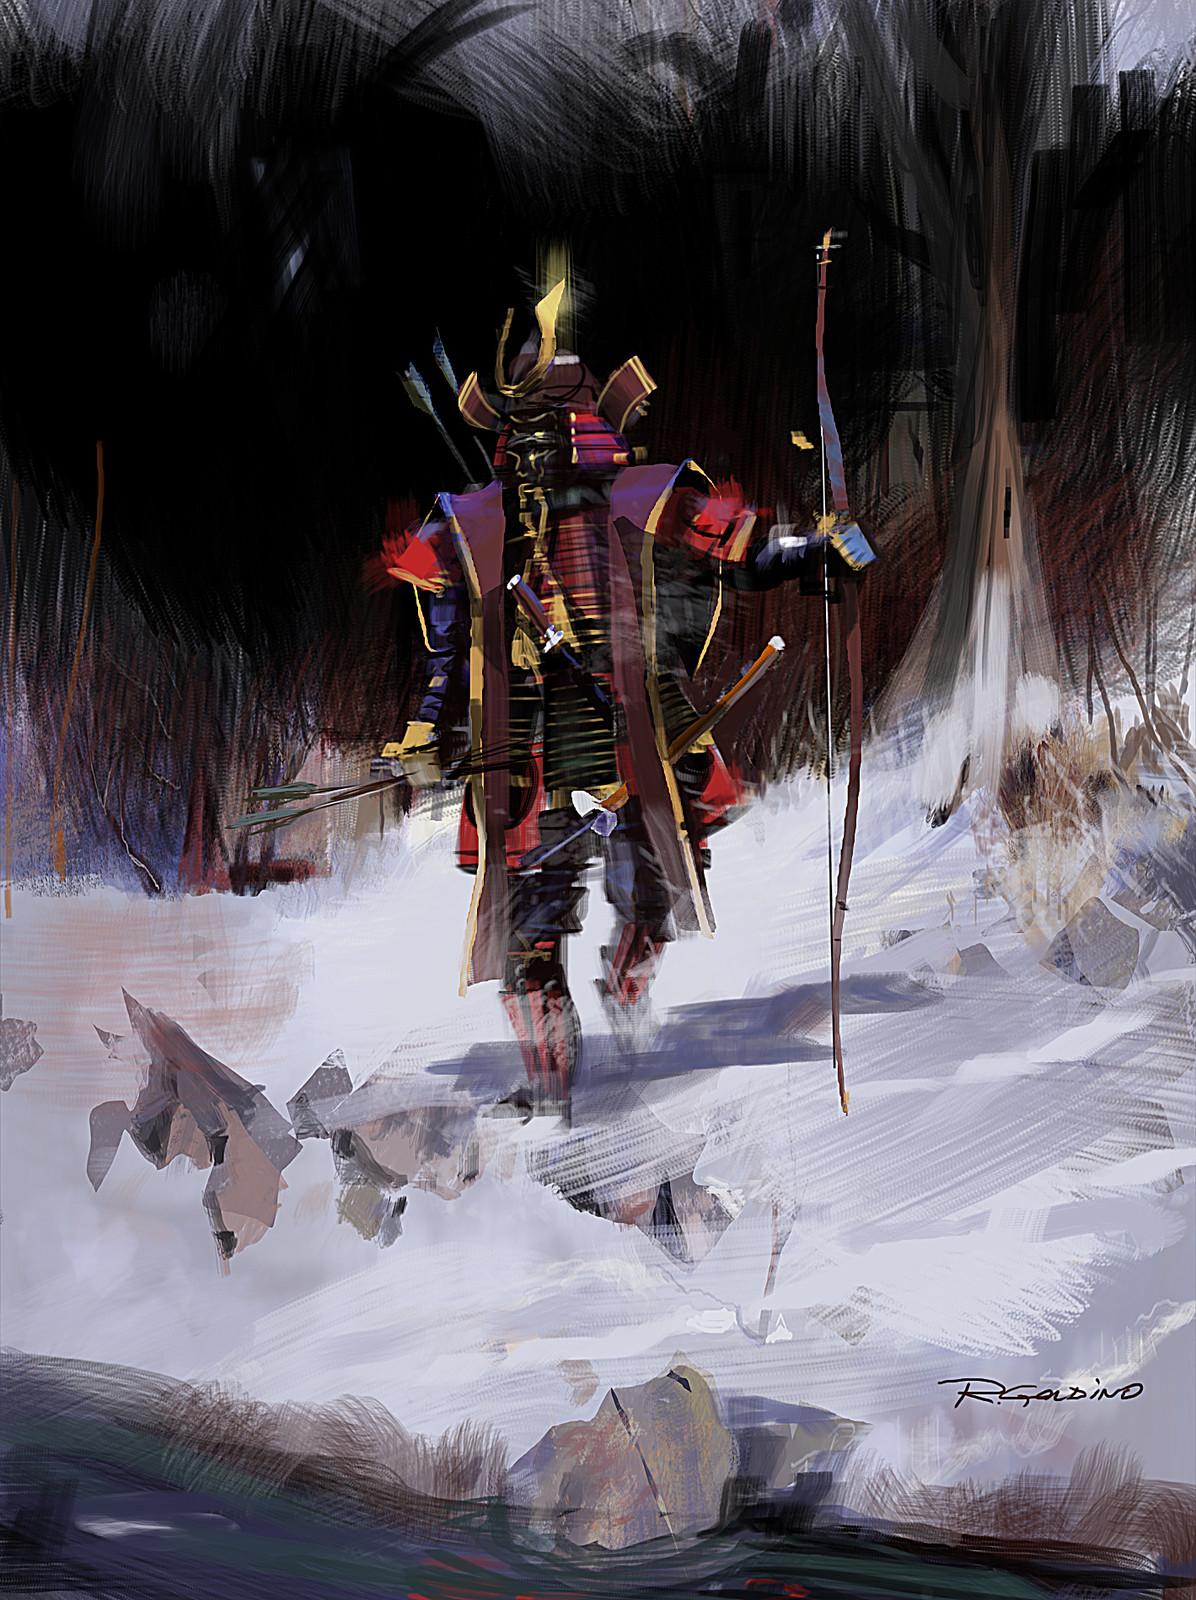 Samurai - After studying Richard Schmid